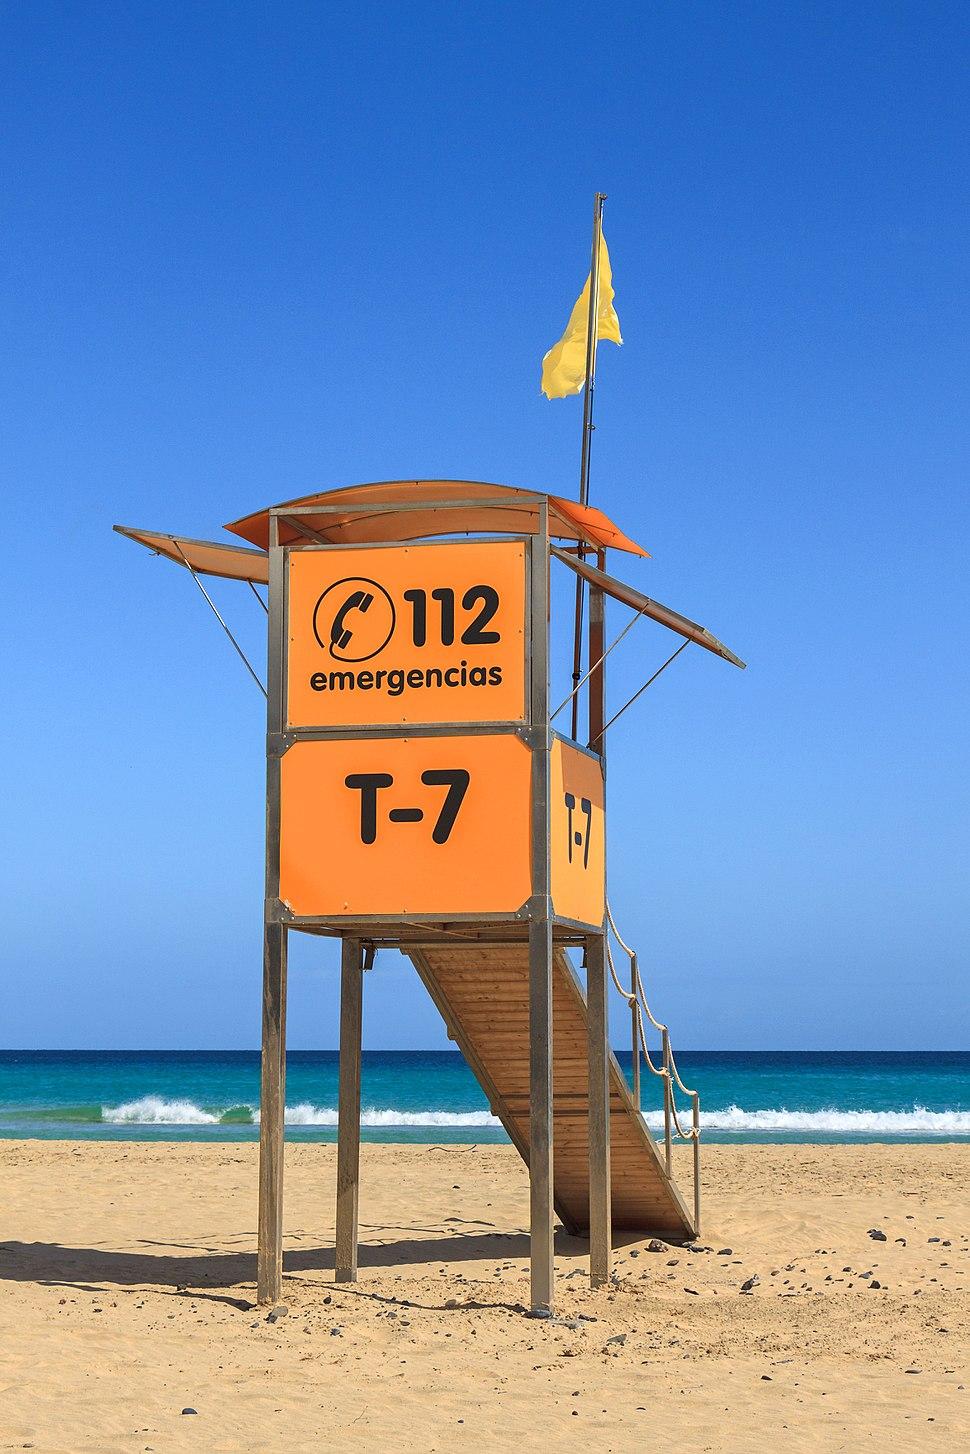 Lifeguard tower - Morro Jable